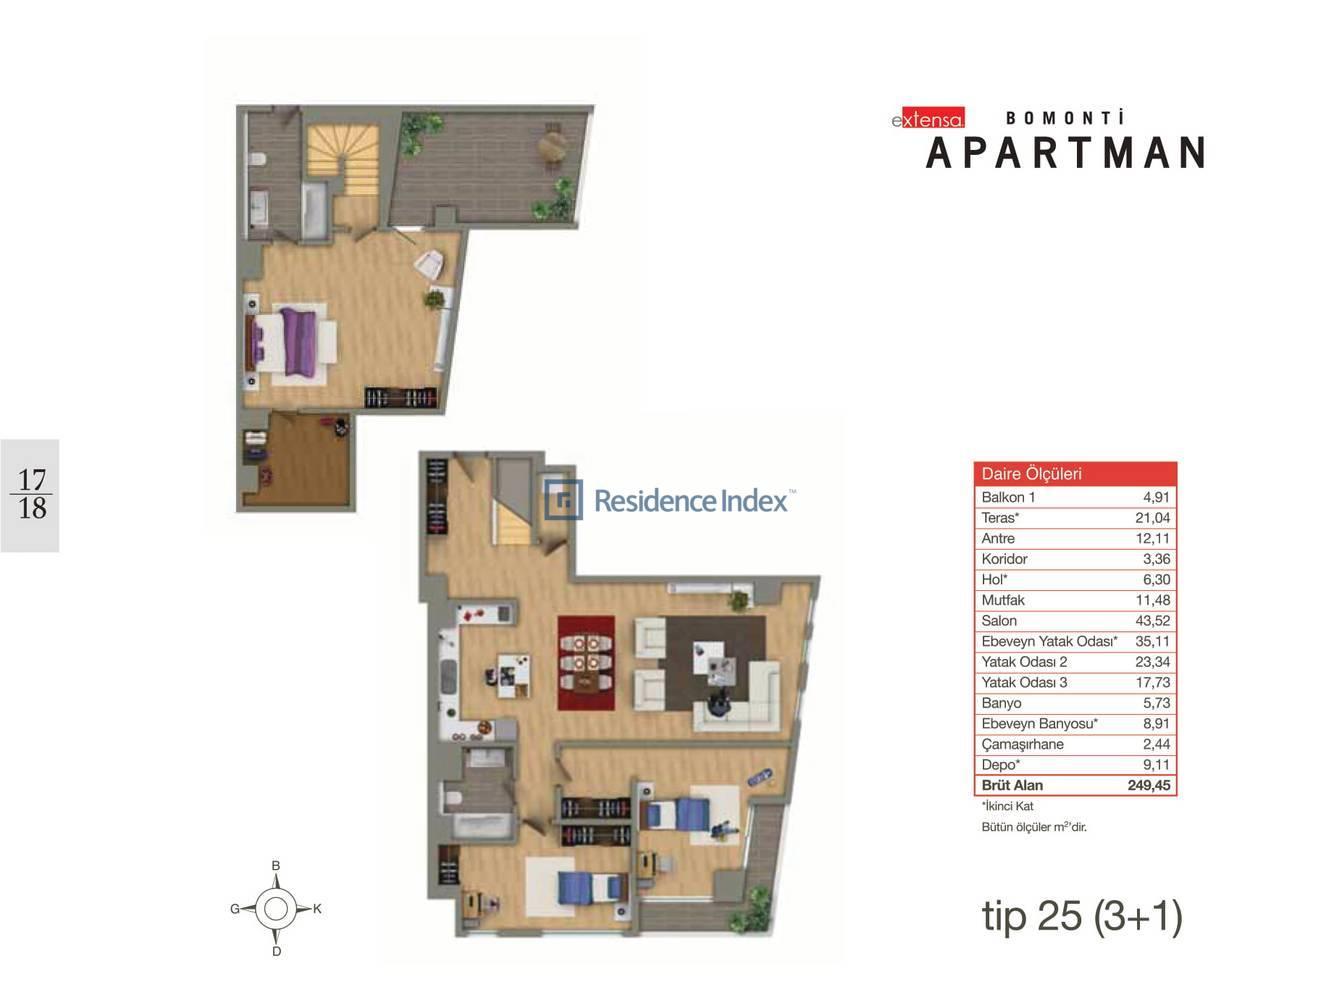 Bomonti Apartmanı Tip 25